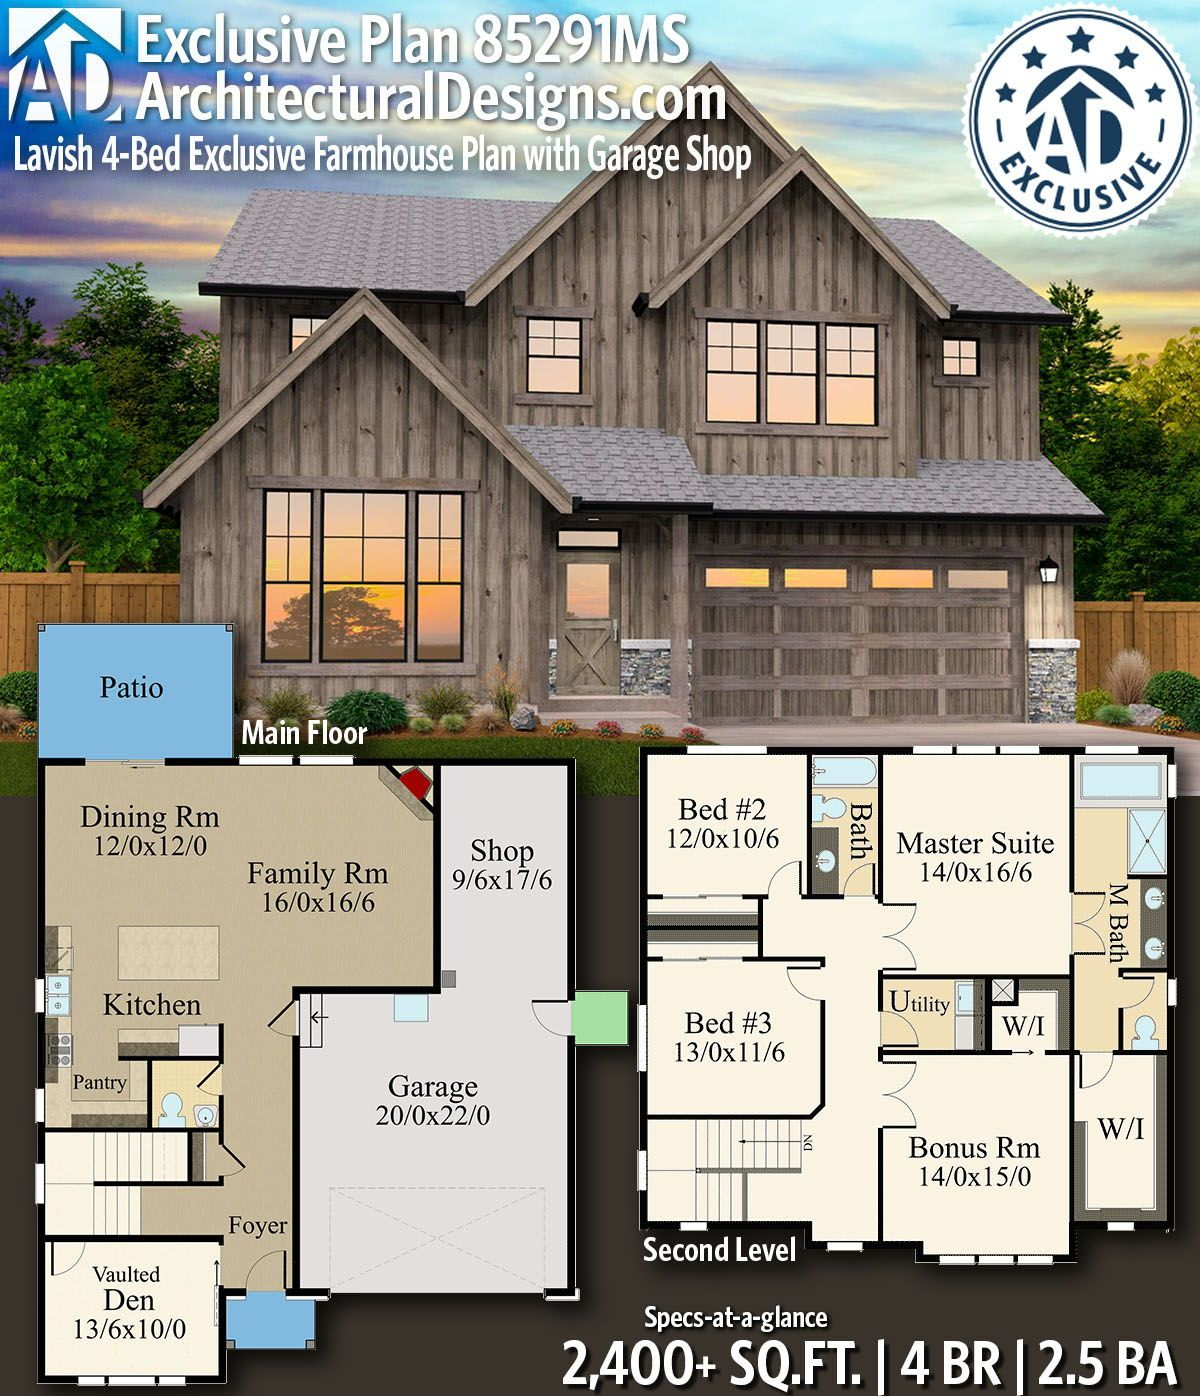 Plan 85291ms Lavish 4 Bed Exclusive Farmhouse Plan With Garage Shop Rustic House Plans Farmhouse Plans Architecture Design